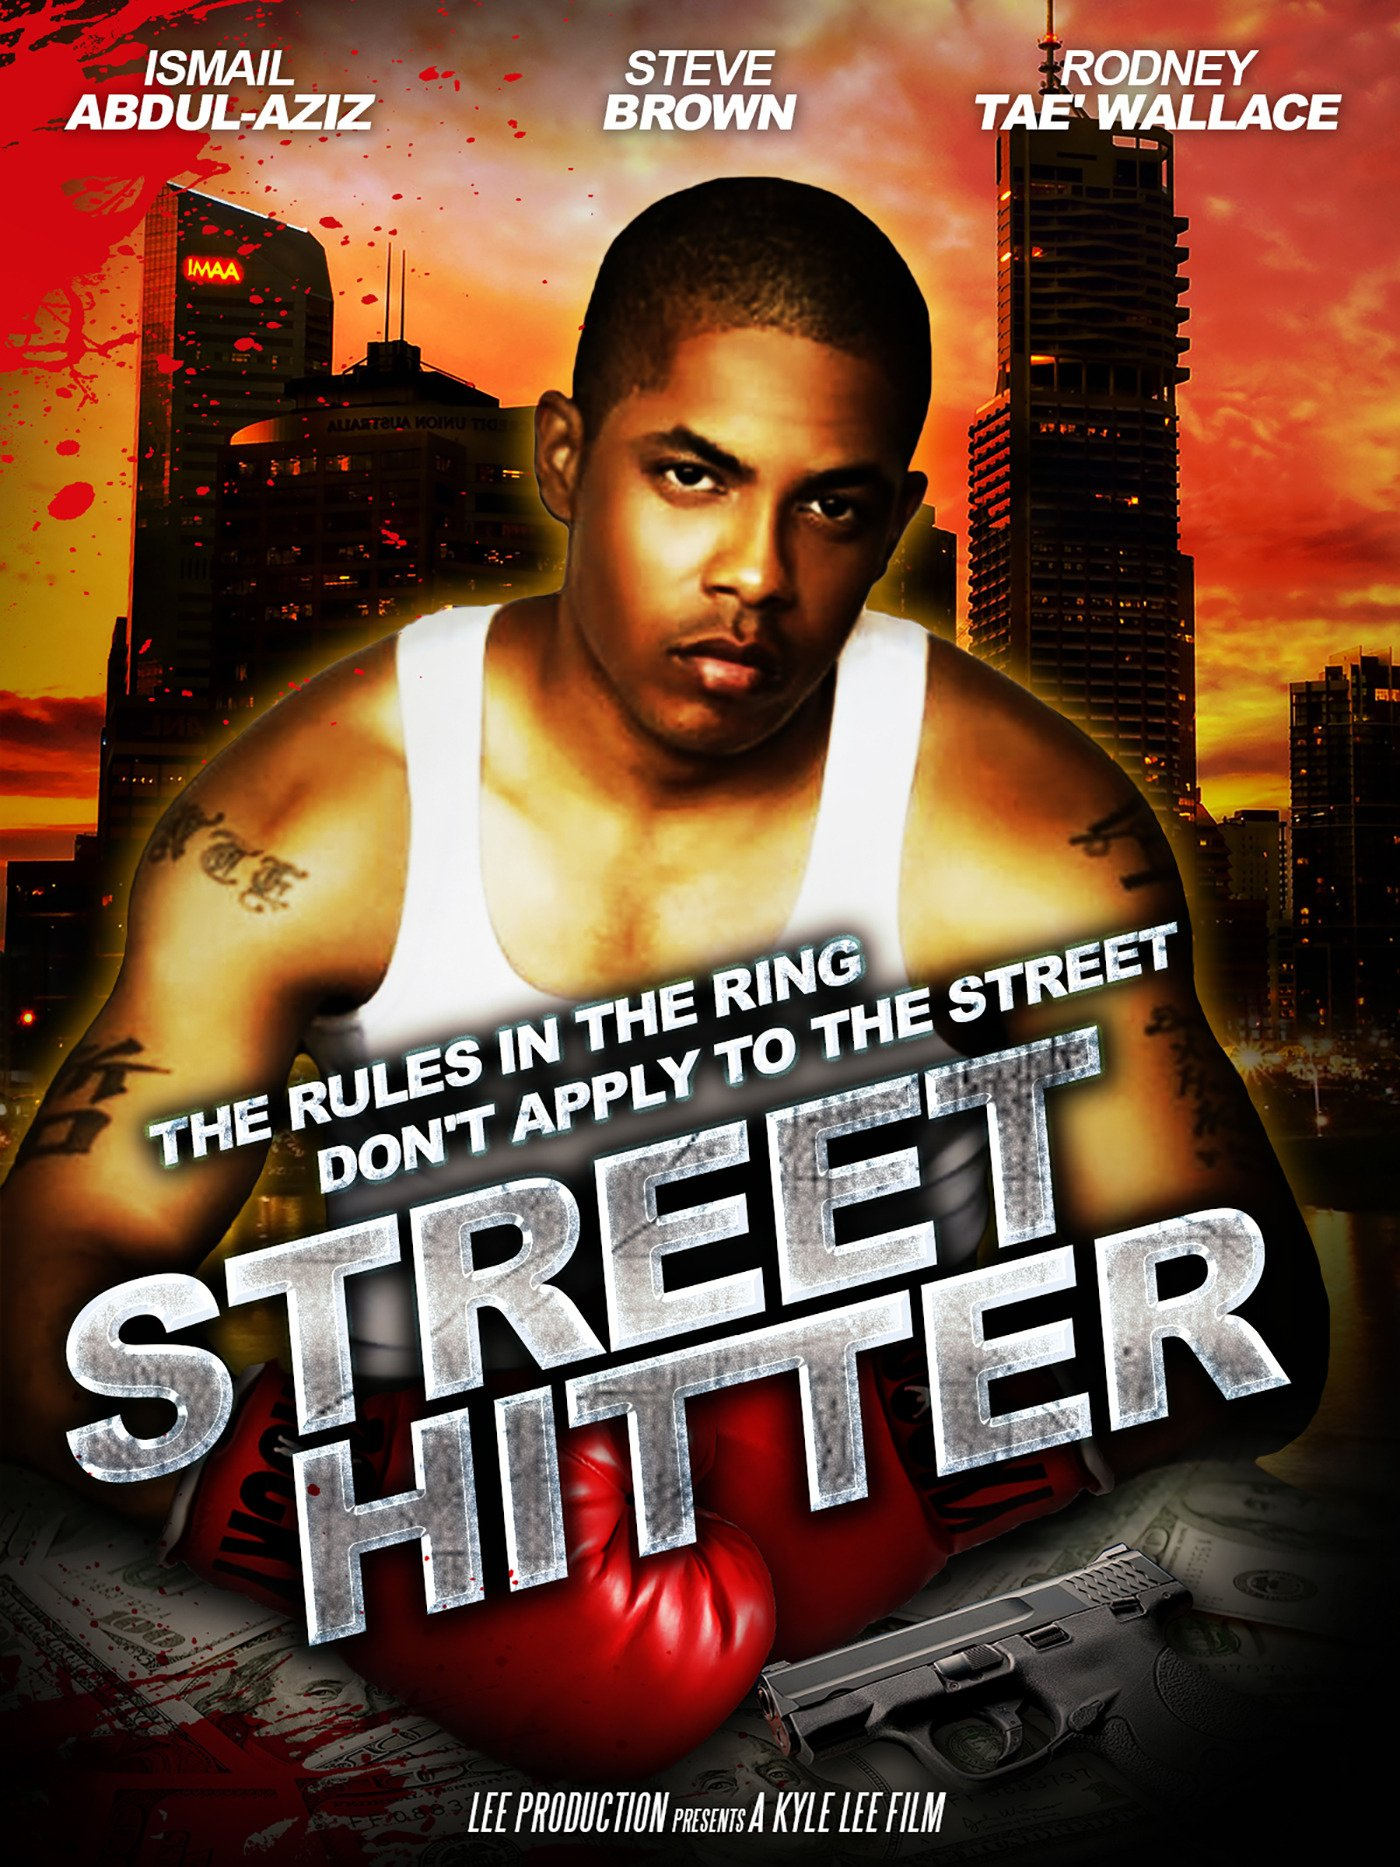 watch street hitter on amazon prime instant video uk